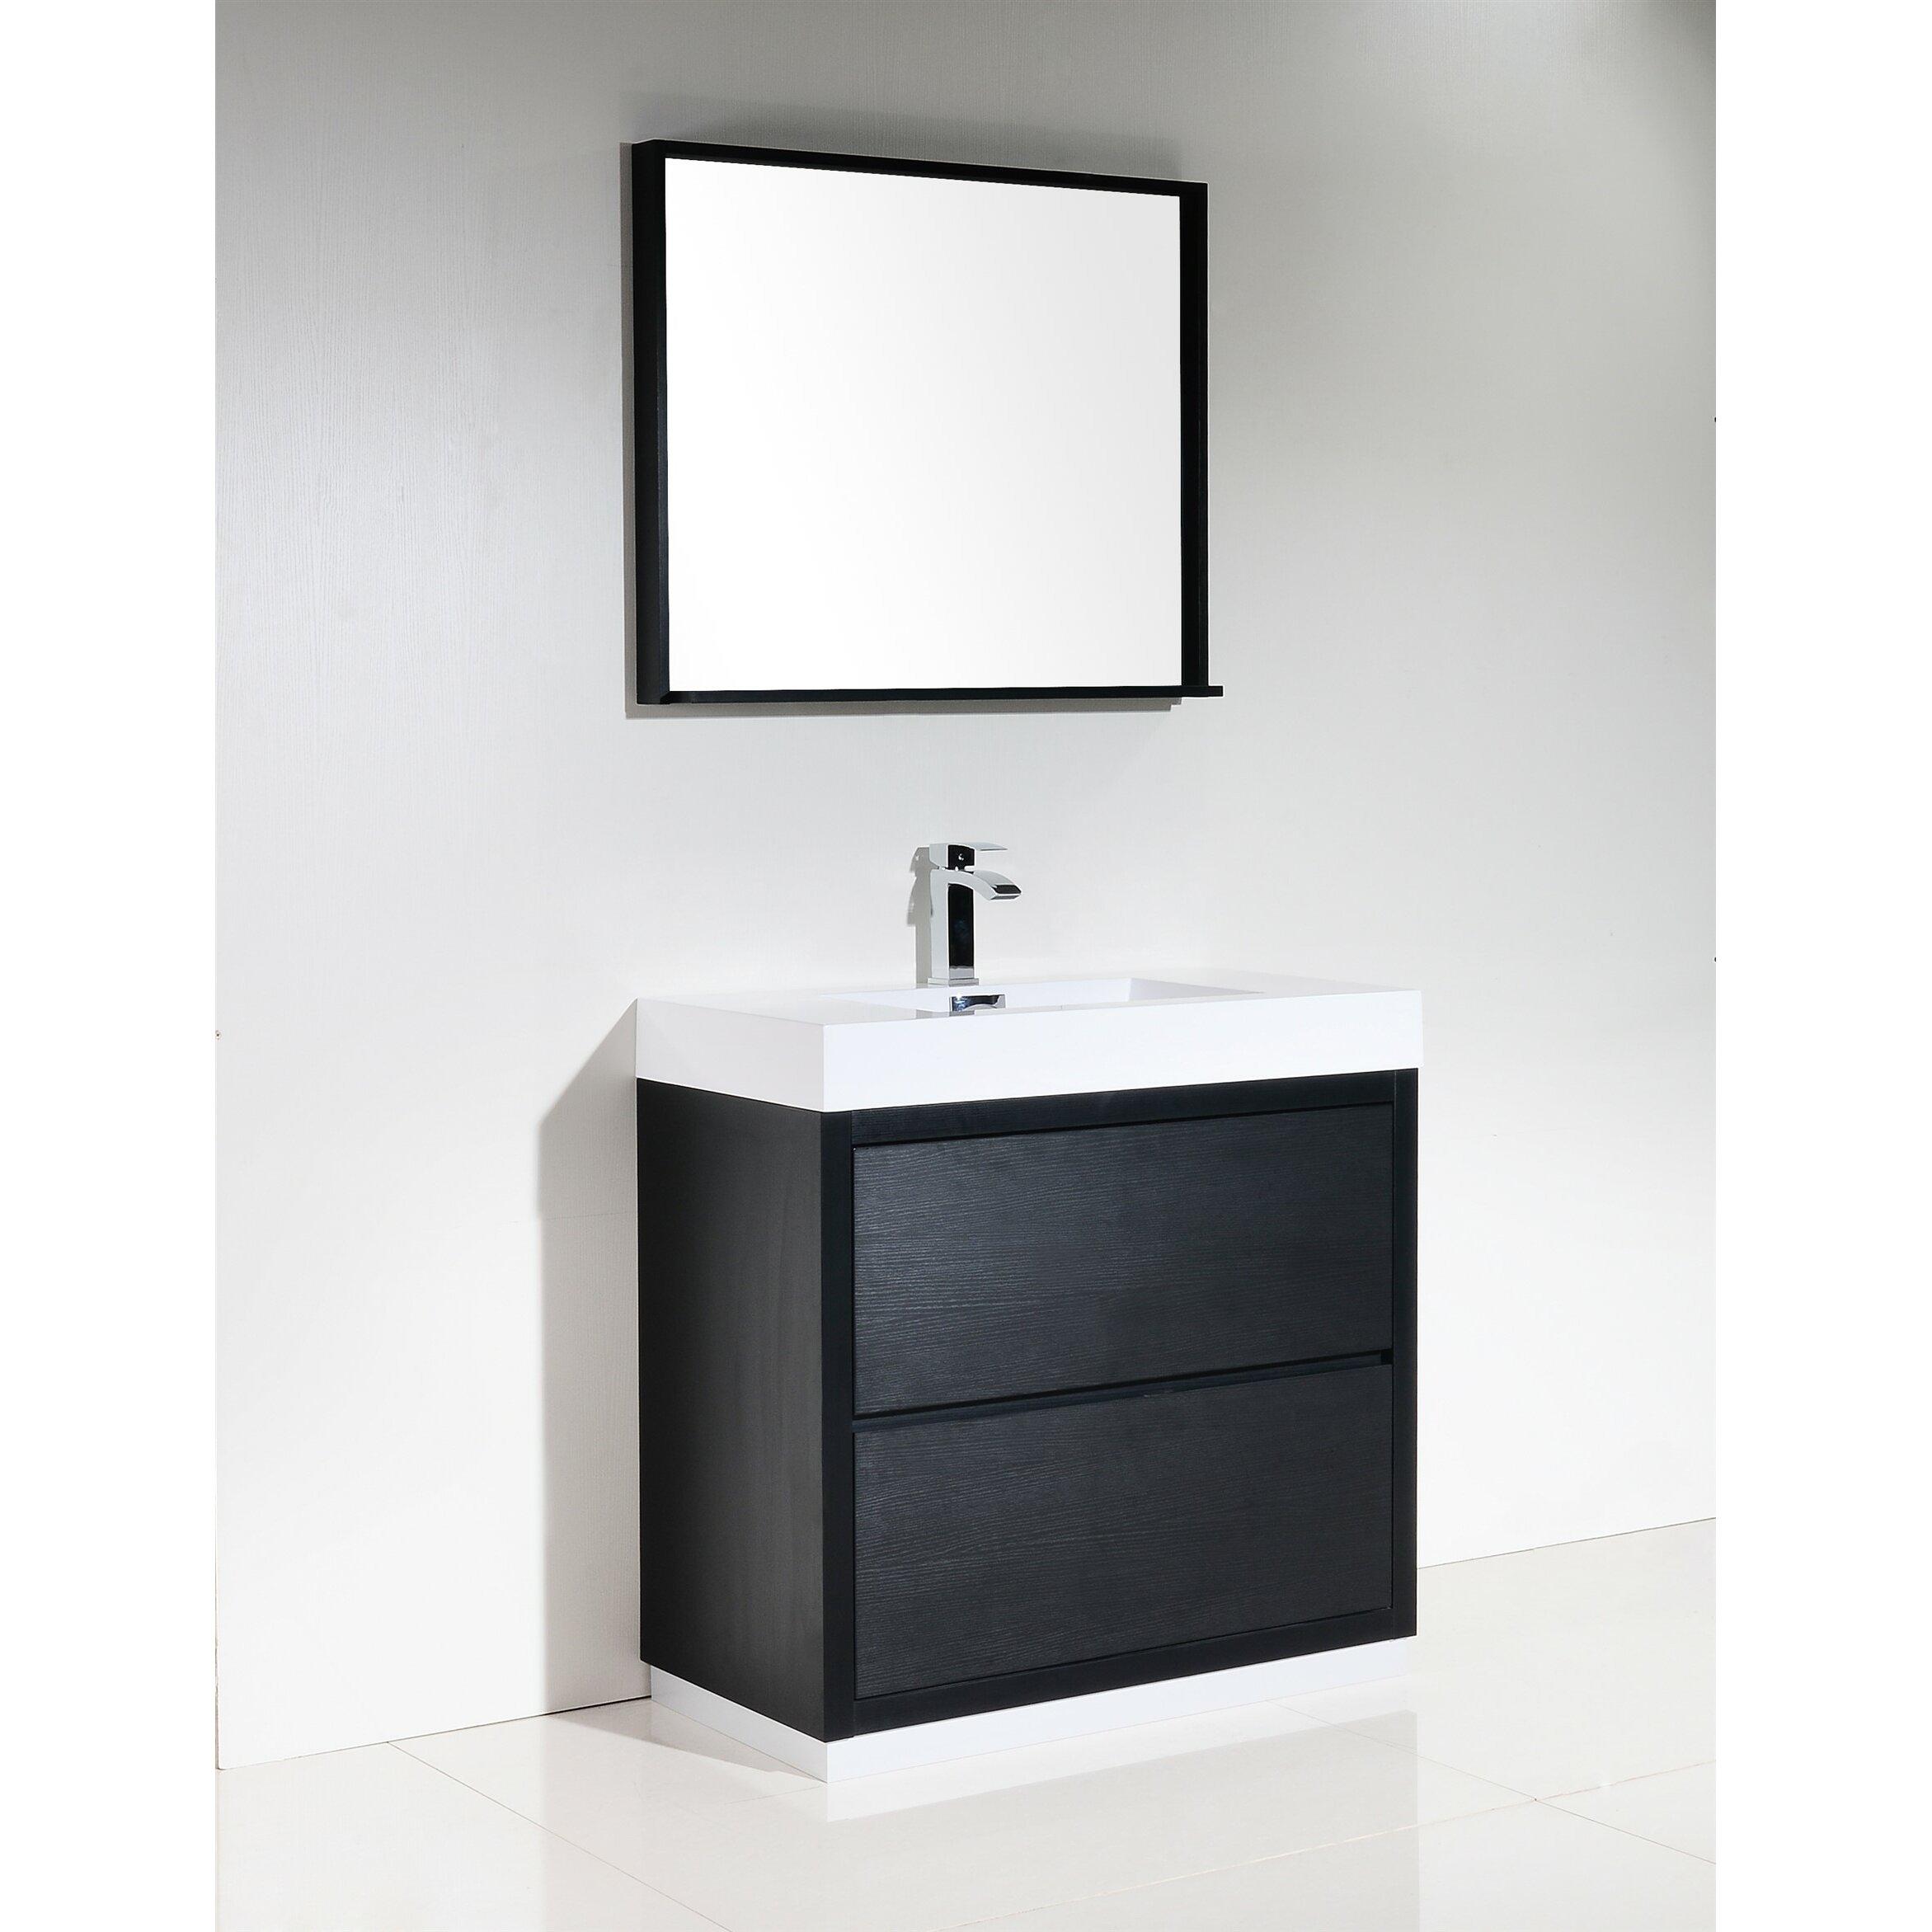 kube bath bliss 36 single free standing modern bathroom vanity set reviews. Black Bedroom Furniture Sets. Home Design Ideas